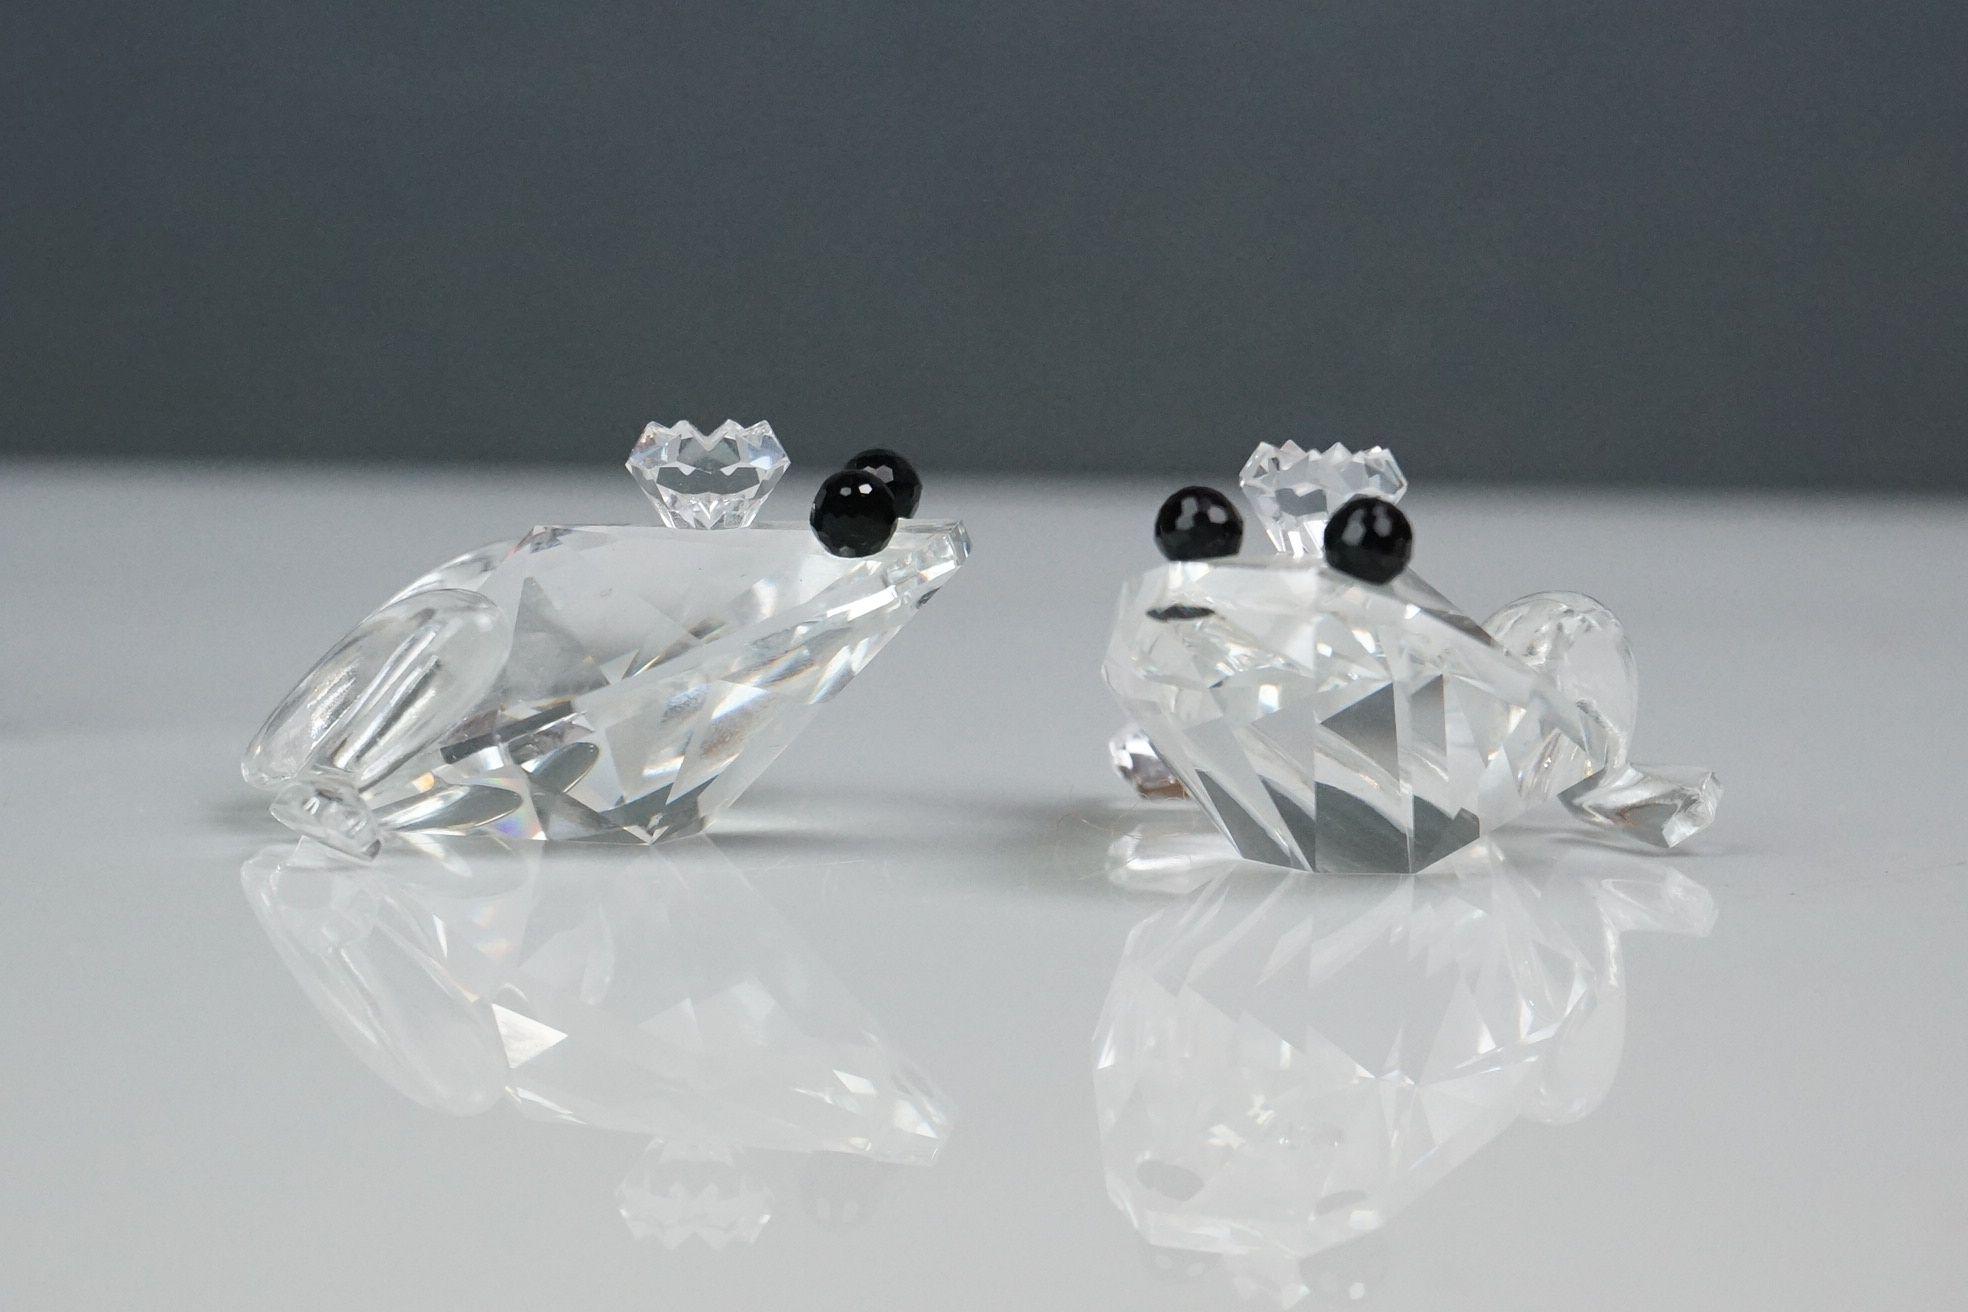 Two Swarovski crystal snails and two Swarovski crystal frogs (2) - Image 3 of 3